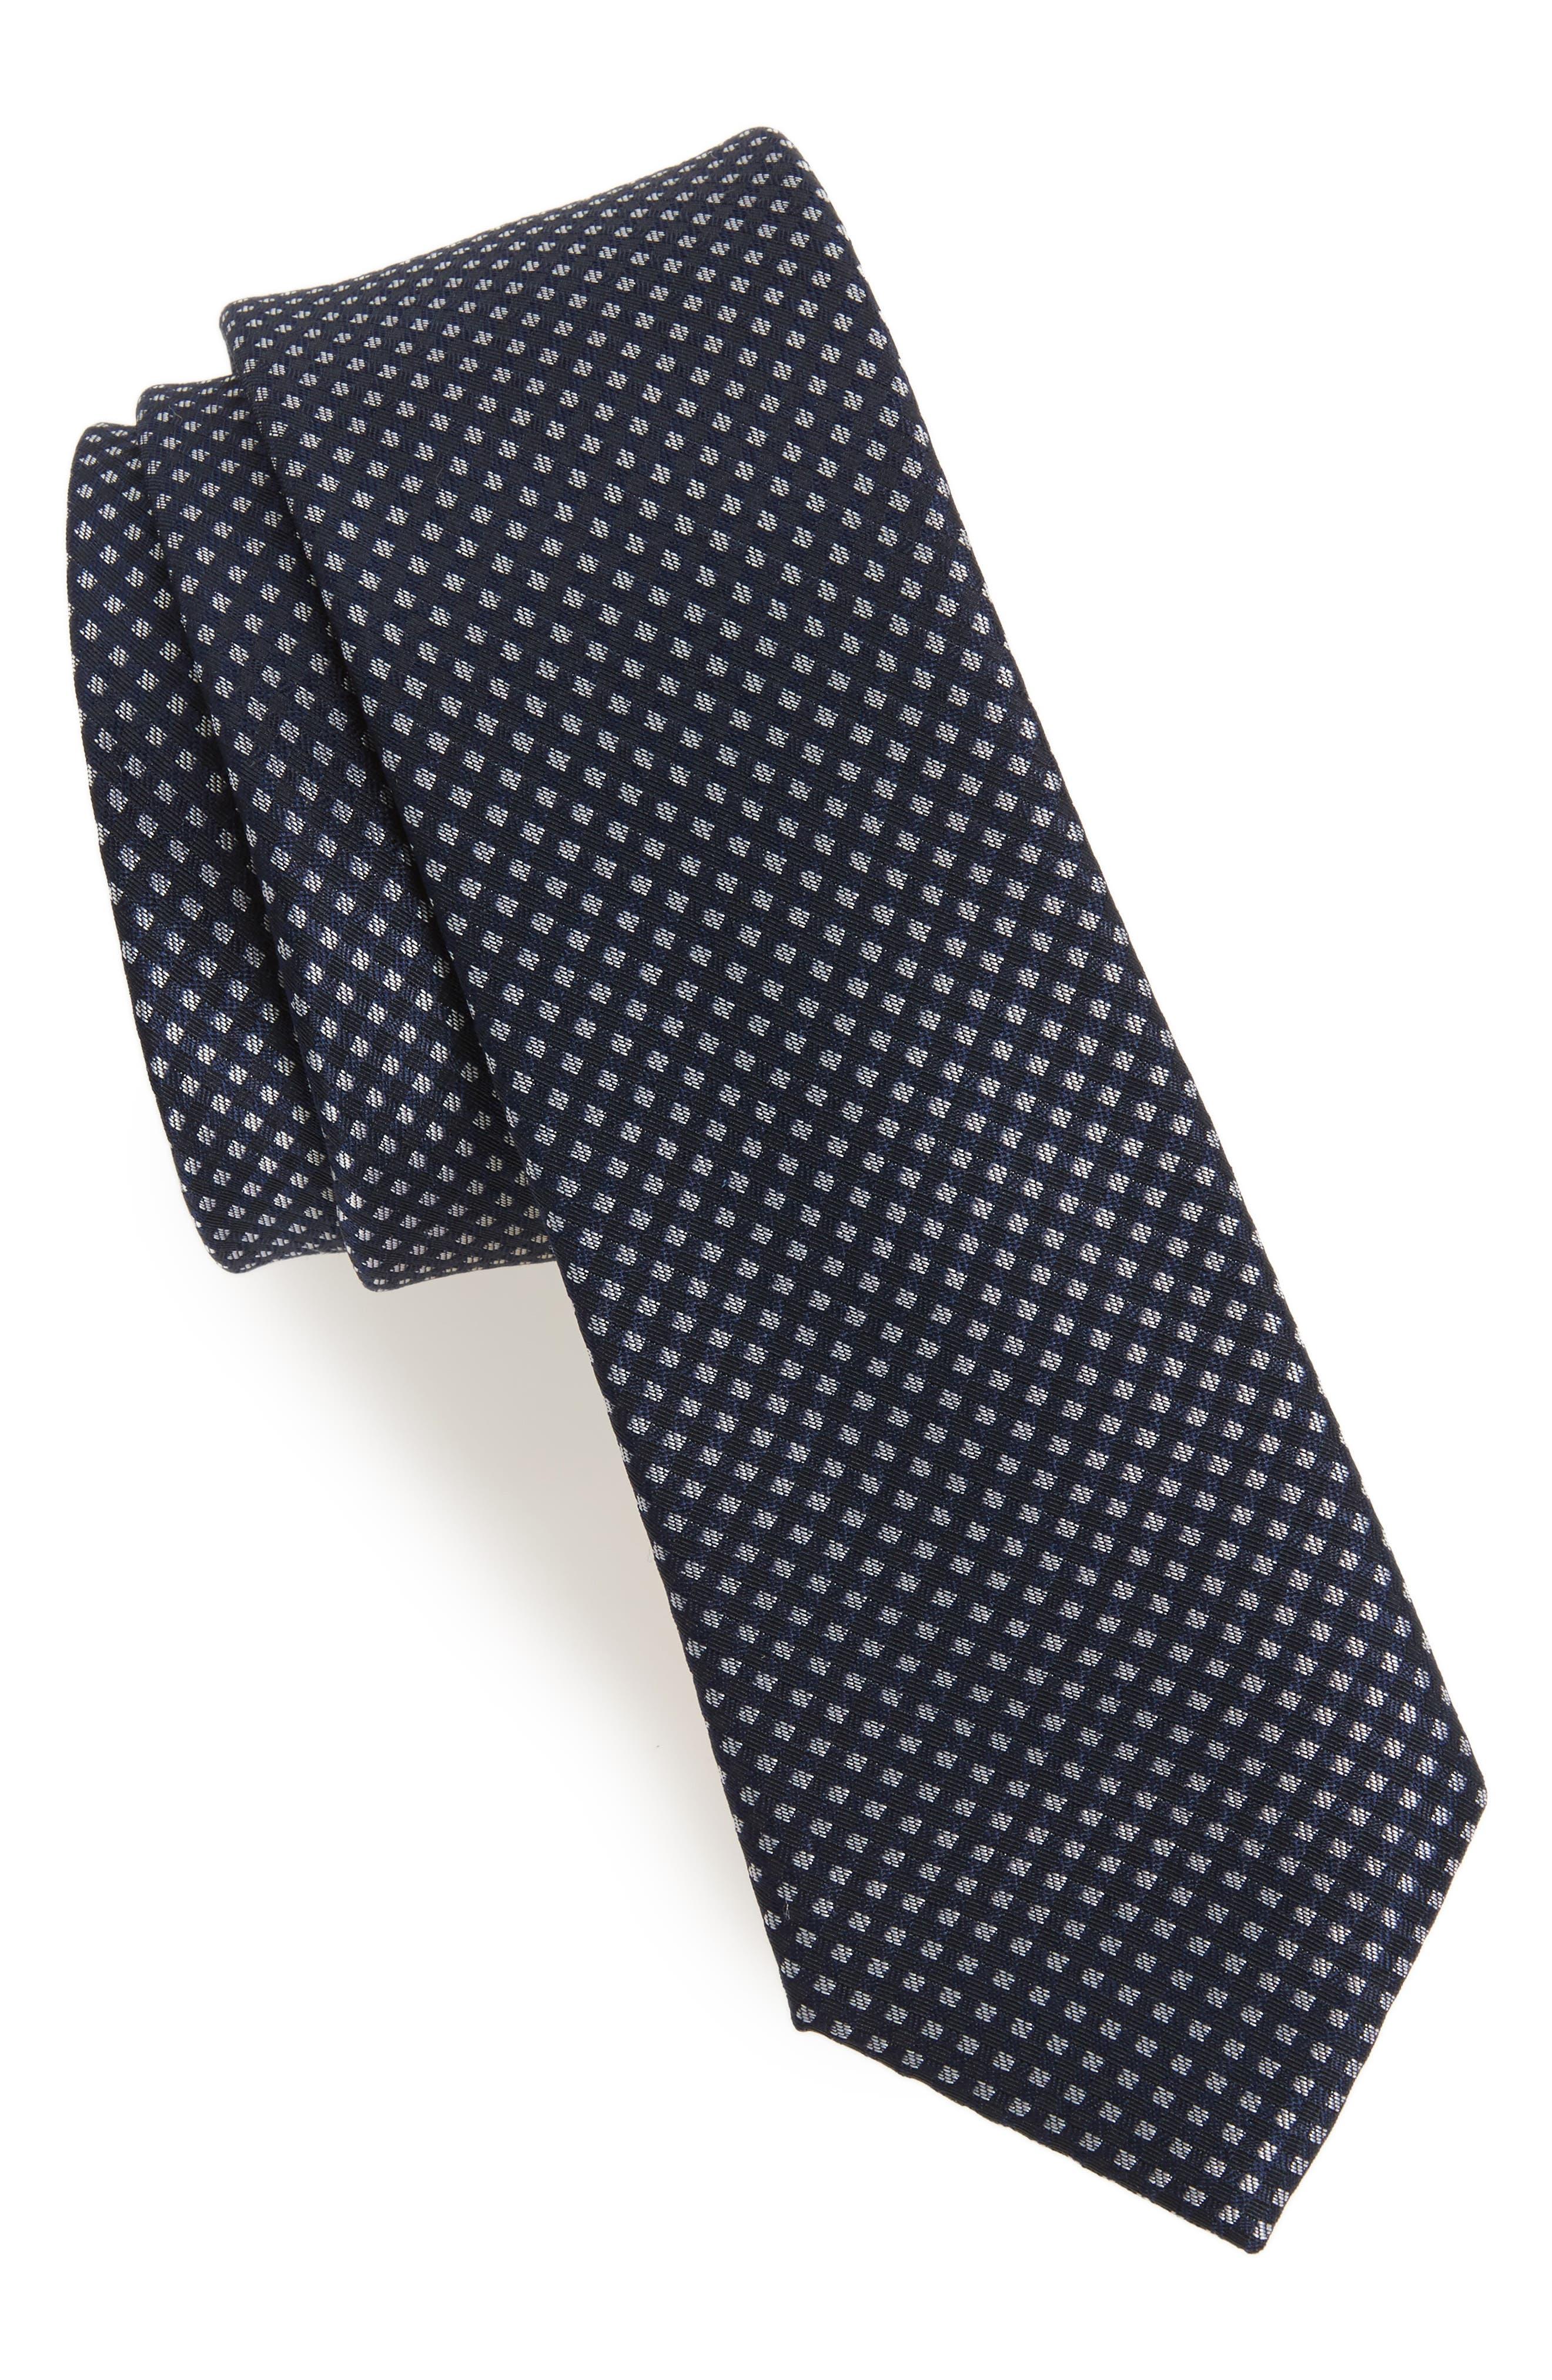 Main Image - Calibrate Midnight Silk Tie